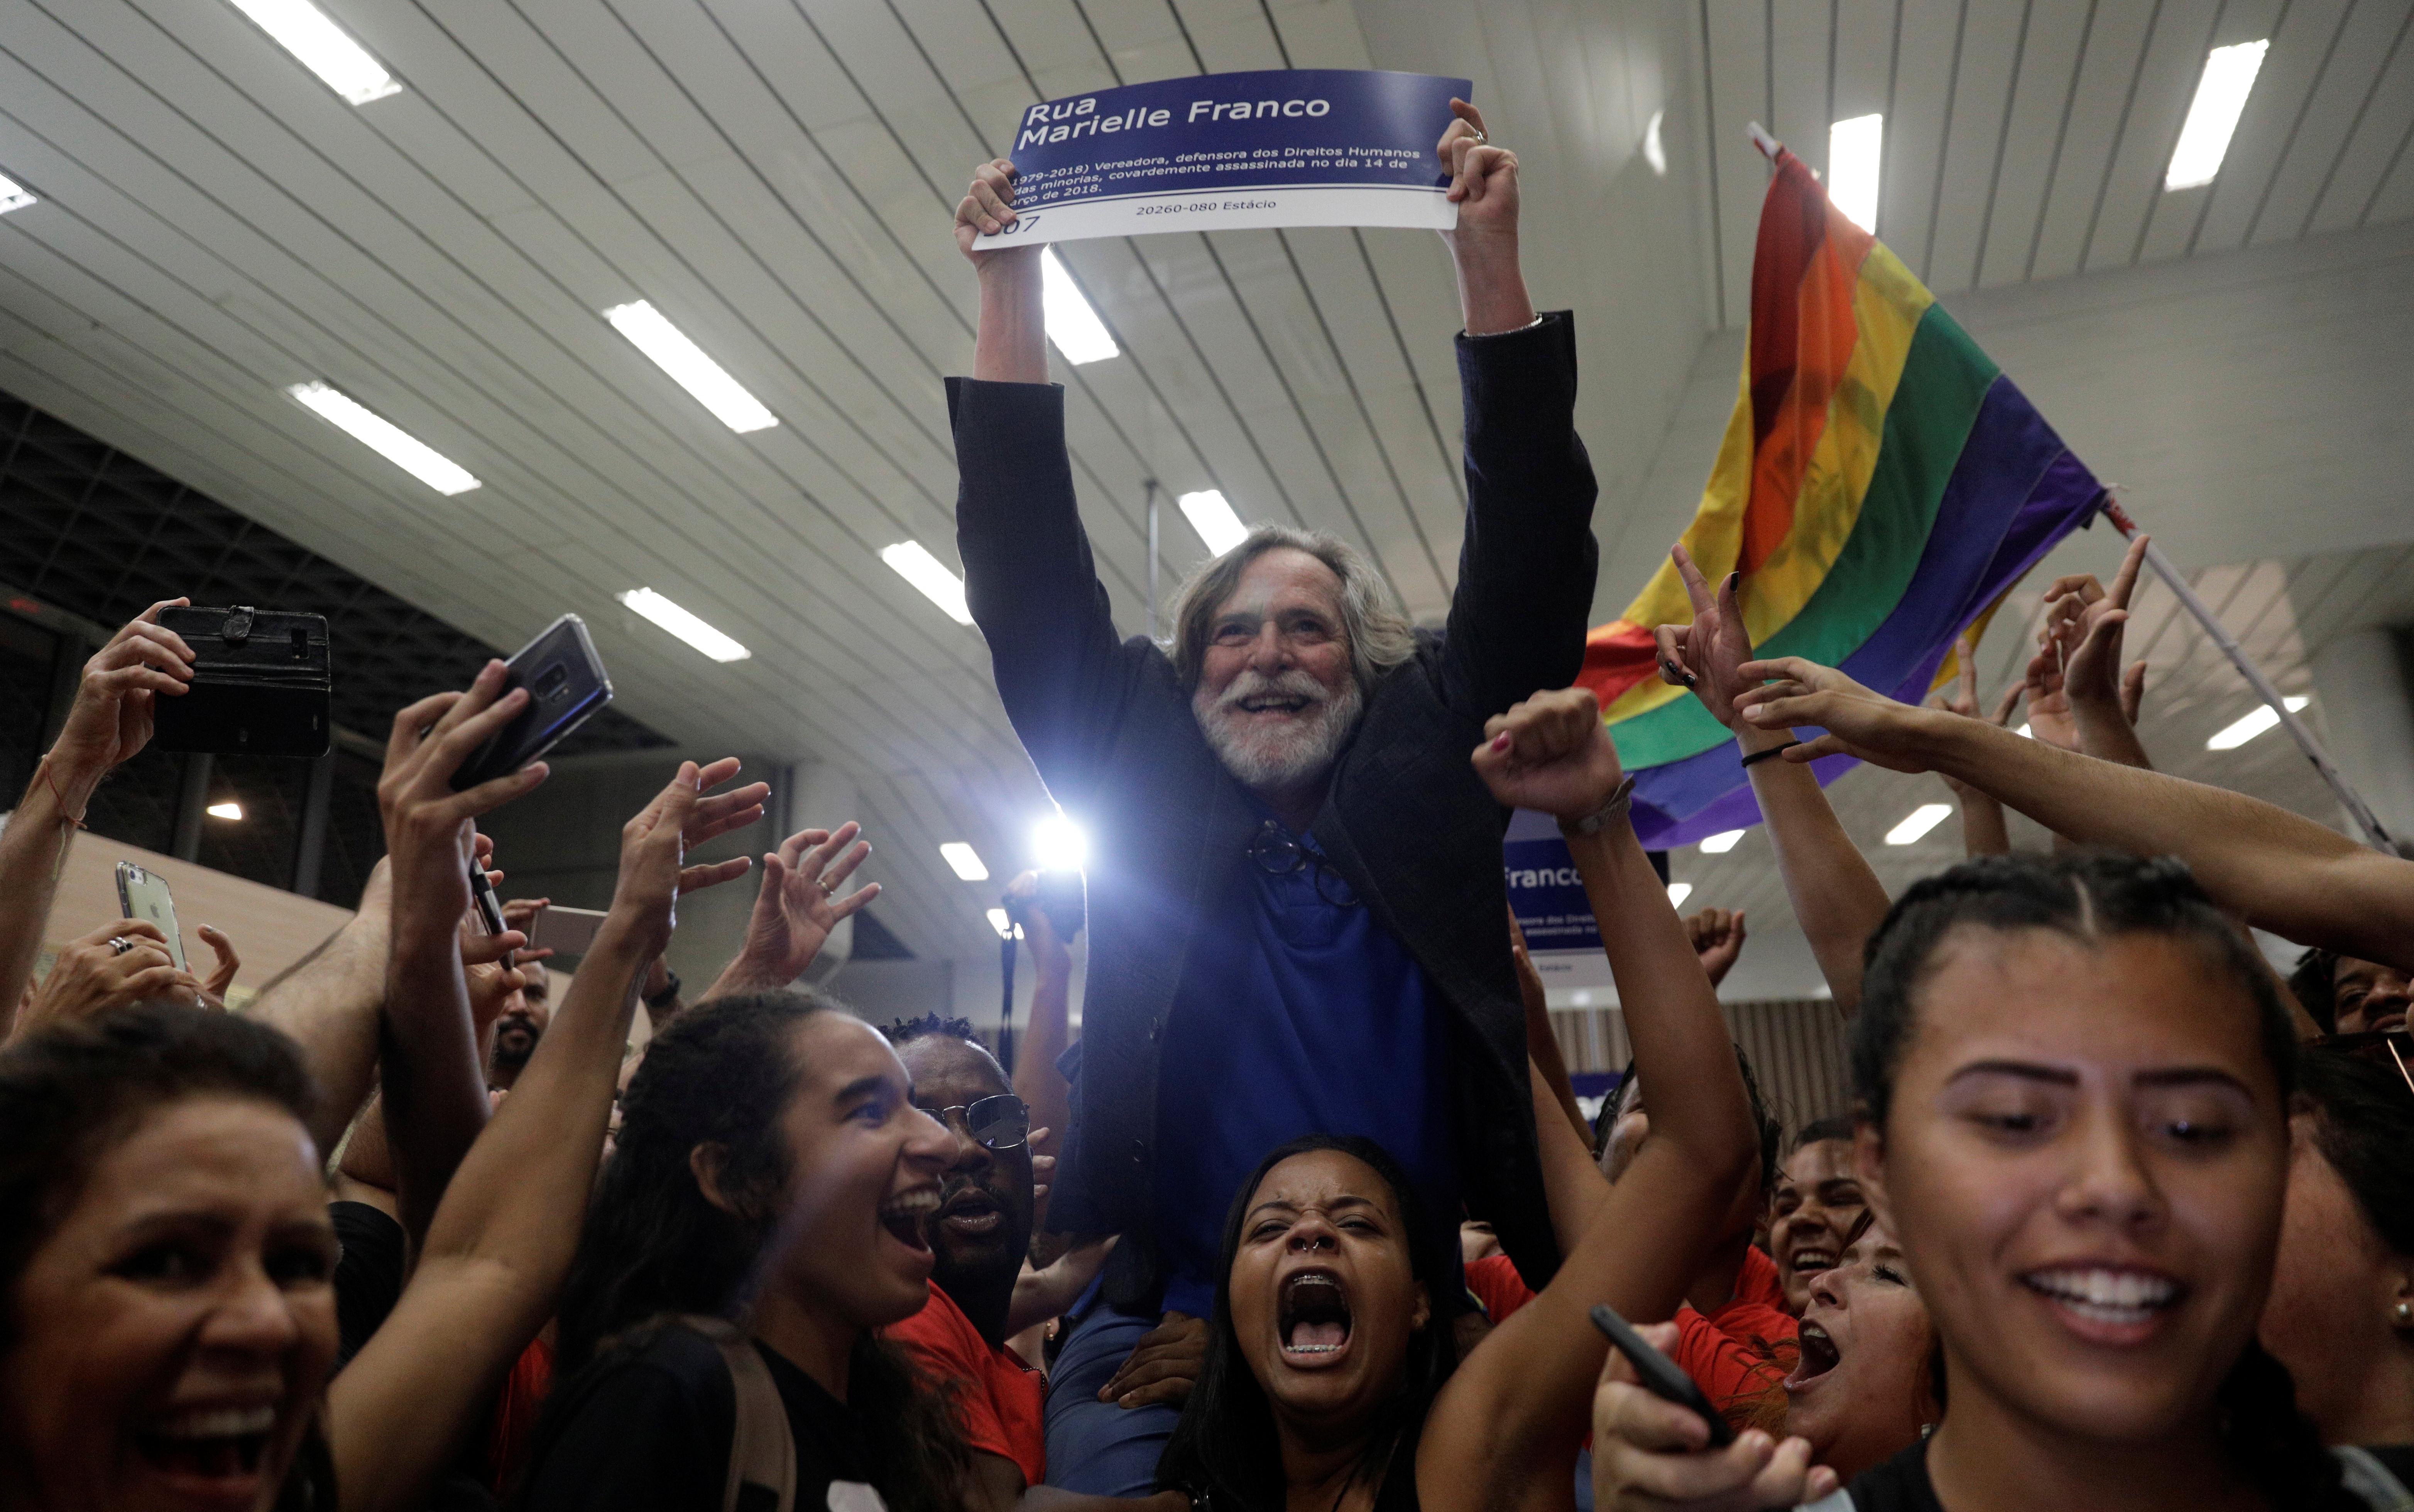 Zé de Abreu: 'Desde que me proclamei presidente, todo mundo pede foto'